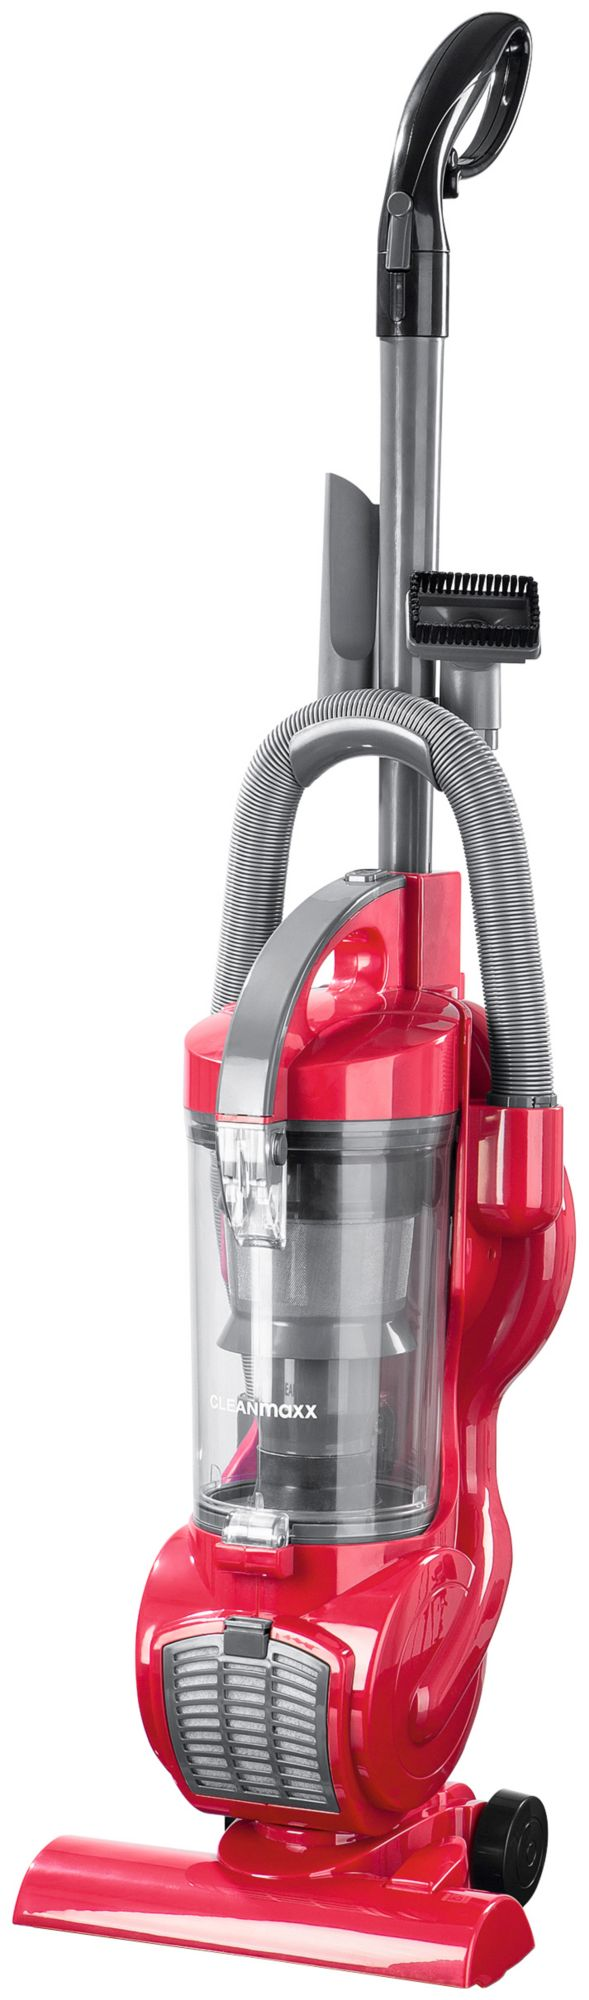 CLEAN MAXX Clean Maxx Zyklon-Staubsauger, beutellos, 800 Watt, Energieklasse A, grau-rot